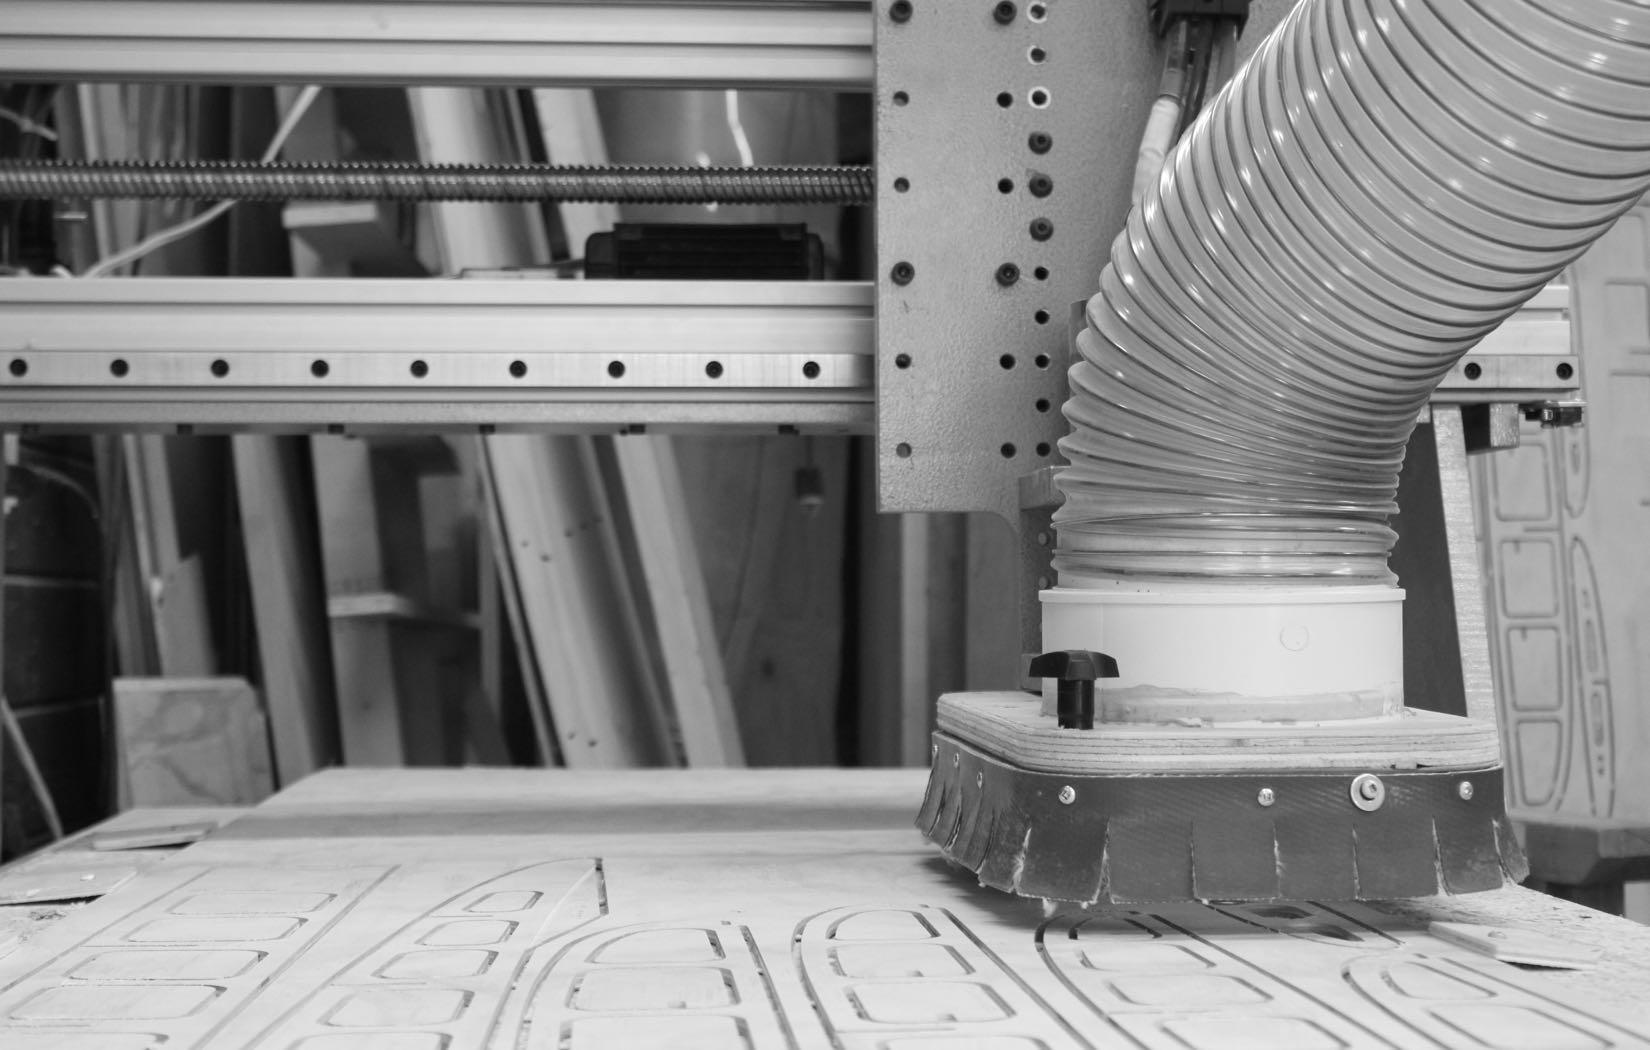 Fishbone Kits - CNC Machine 1650x1050